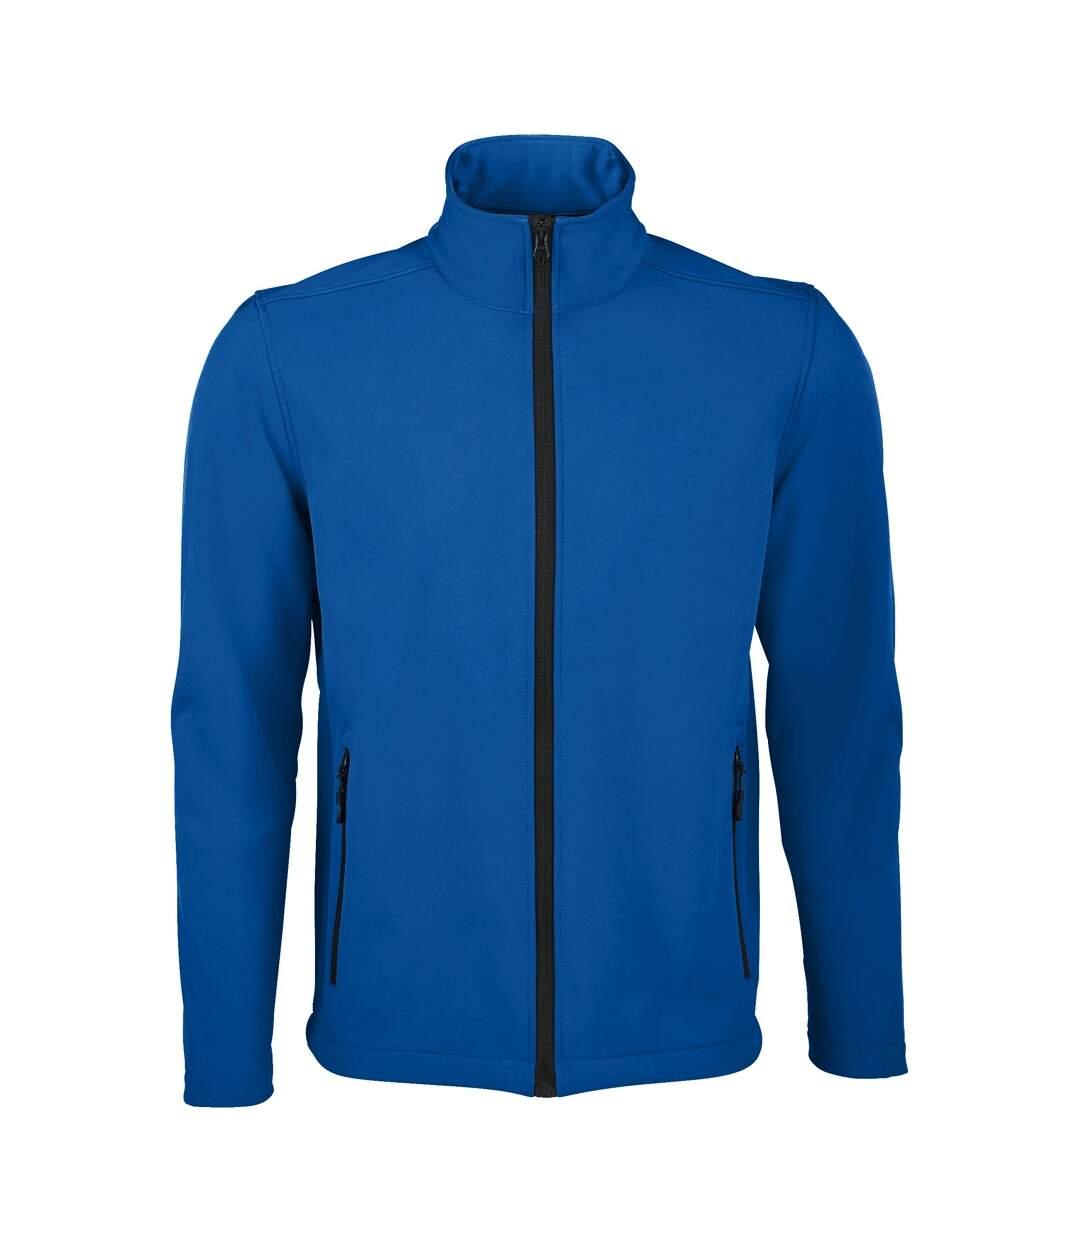 SOLS Mens Race Full Zip Water Repellent Softshell Jacket (Royal Blue) - UTPC2549